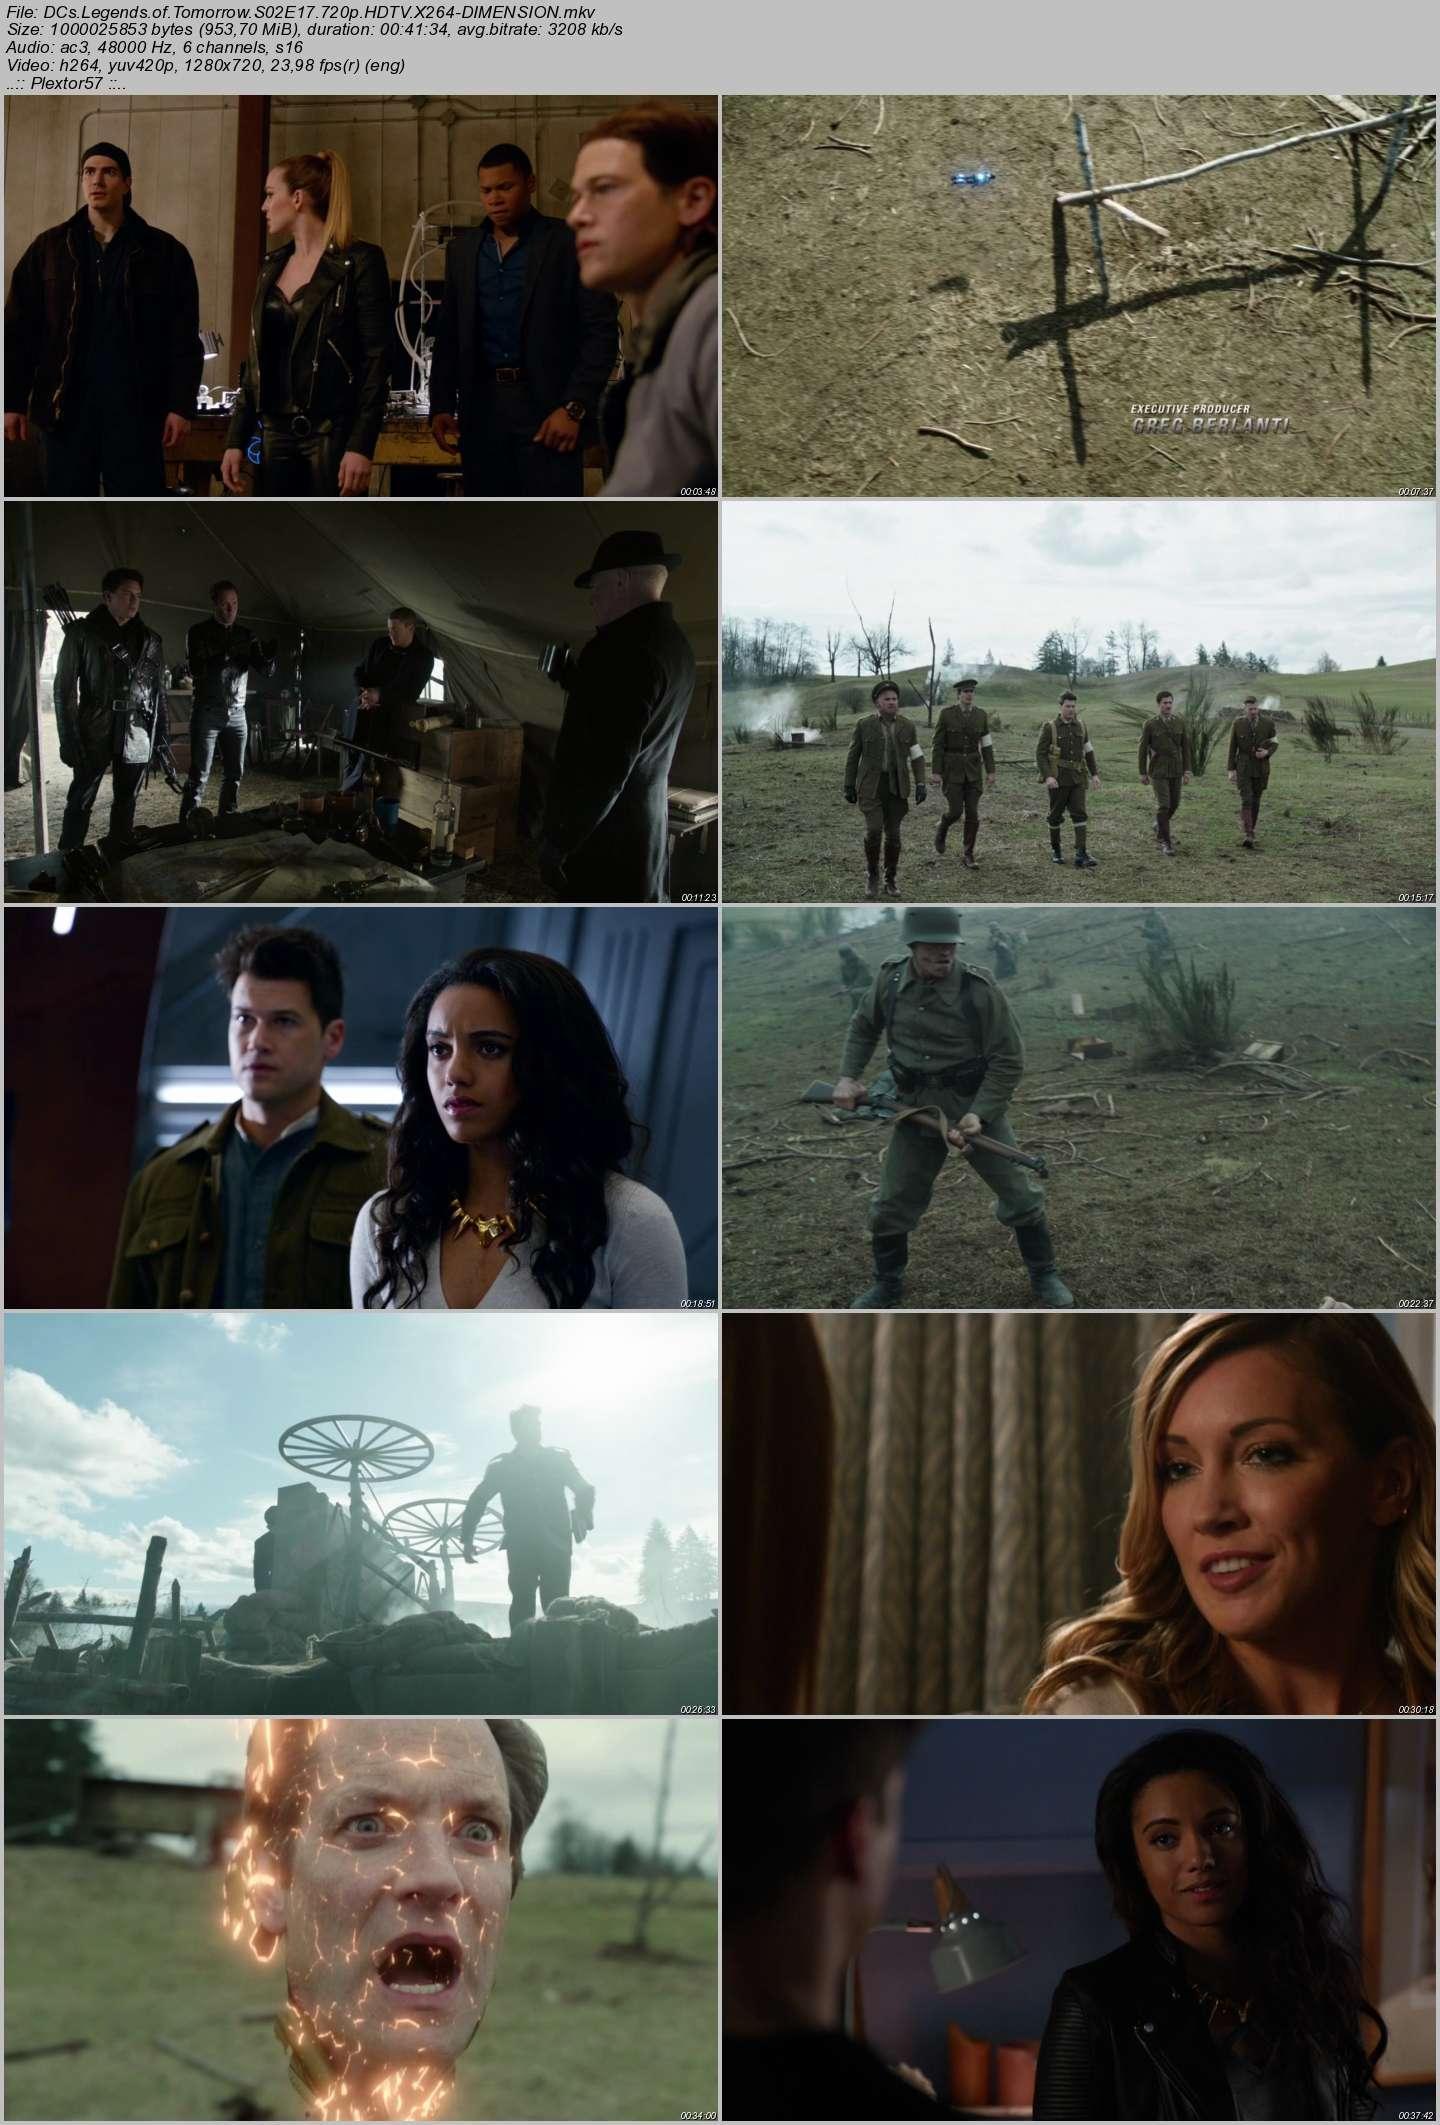 DCs Legends of Tomorrow 2.sezon online